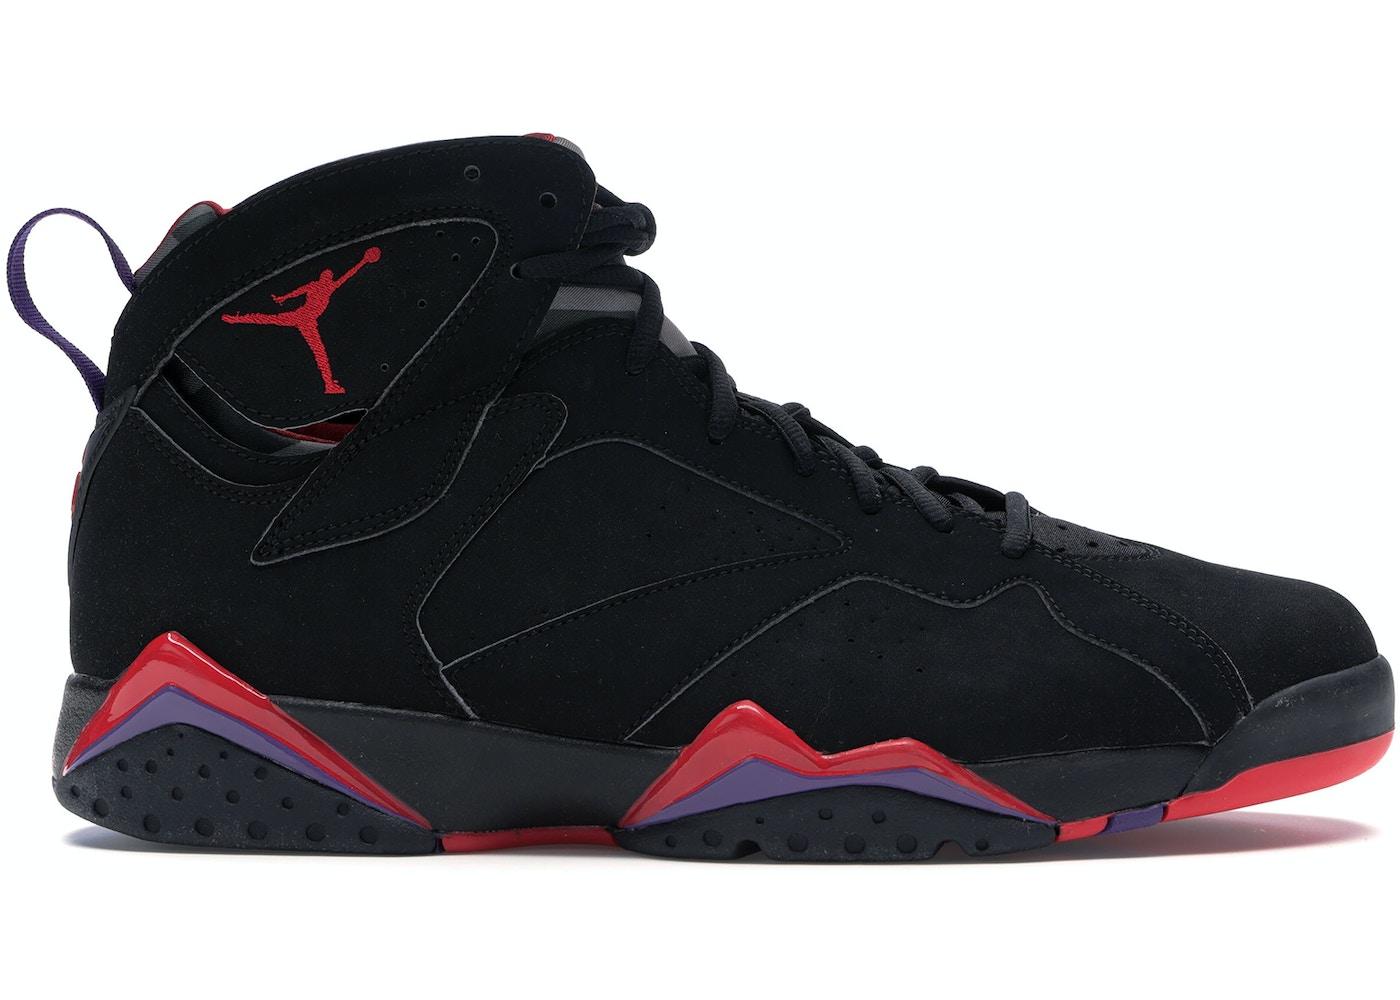 buy online d71dc b4788 Jordan 7 Retro Raptors (2012) - 304775-018